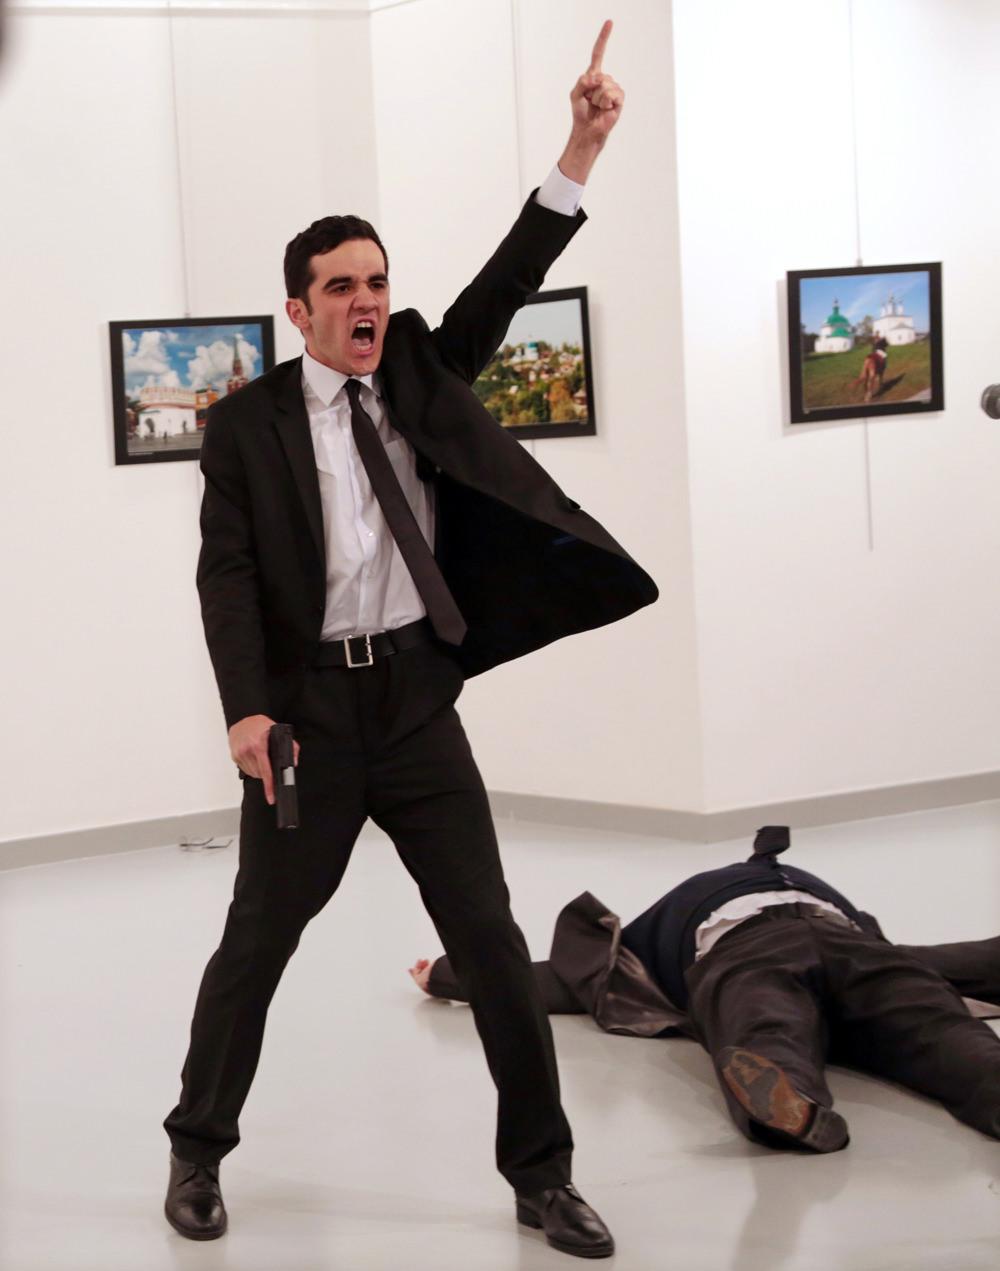 An Assassination in Turkey